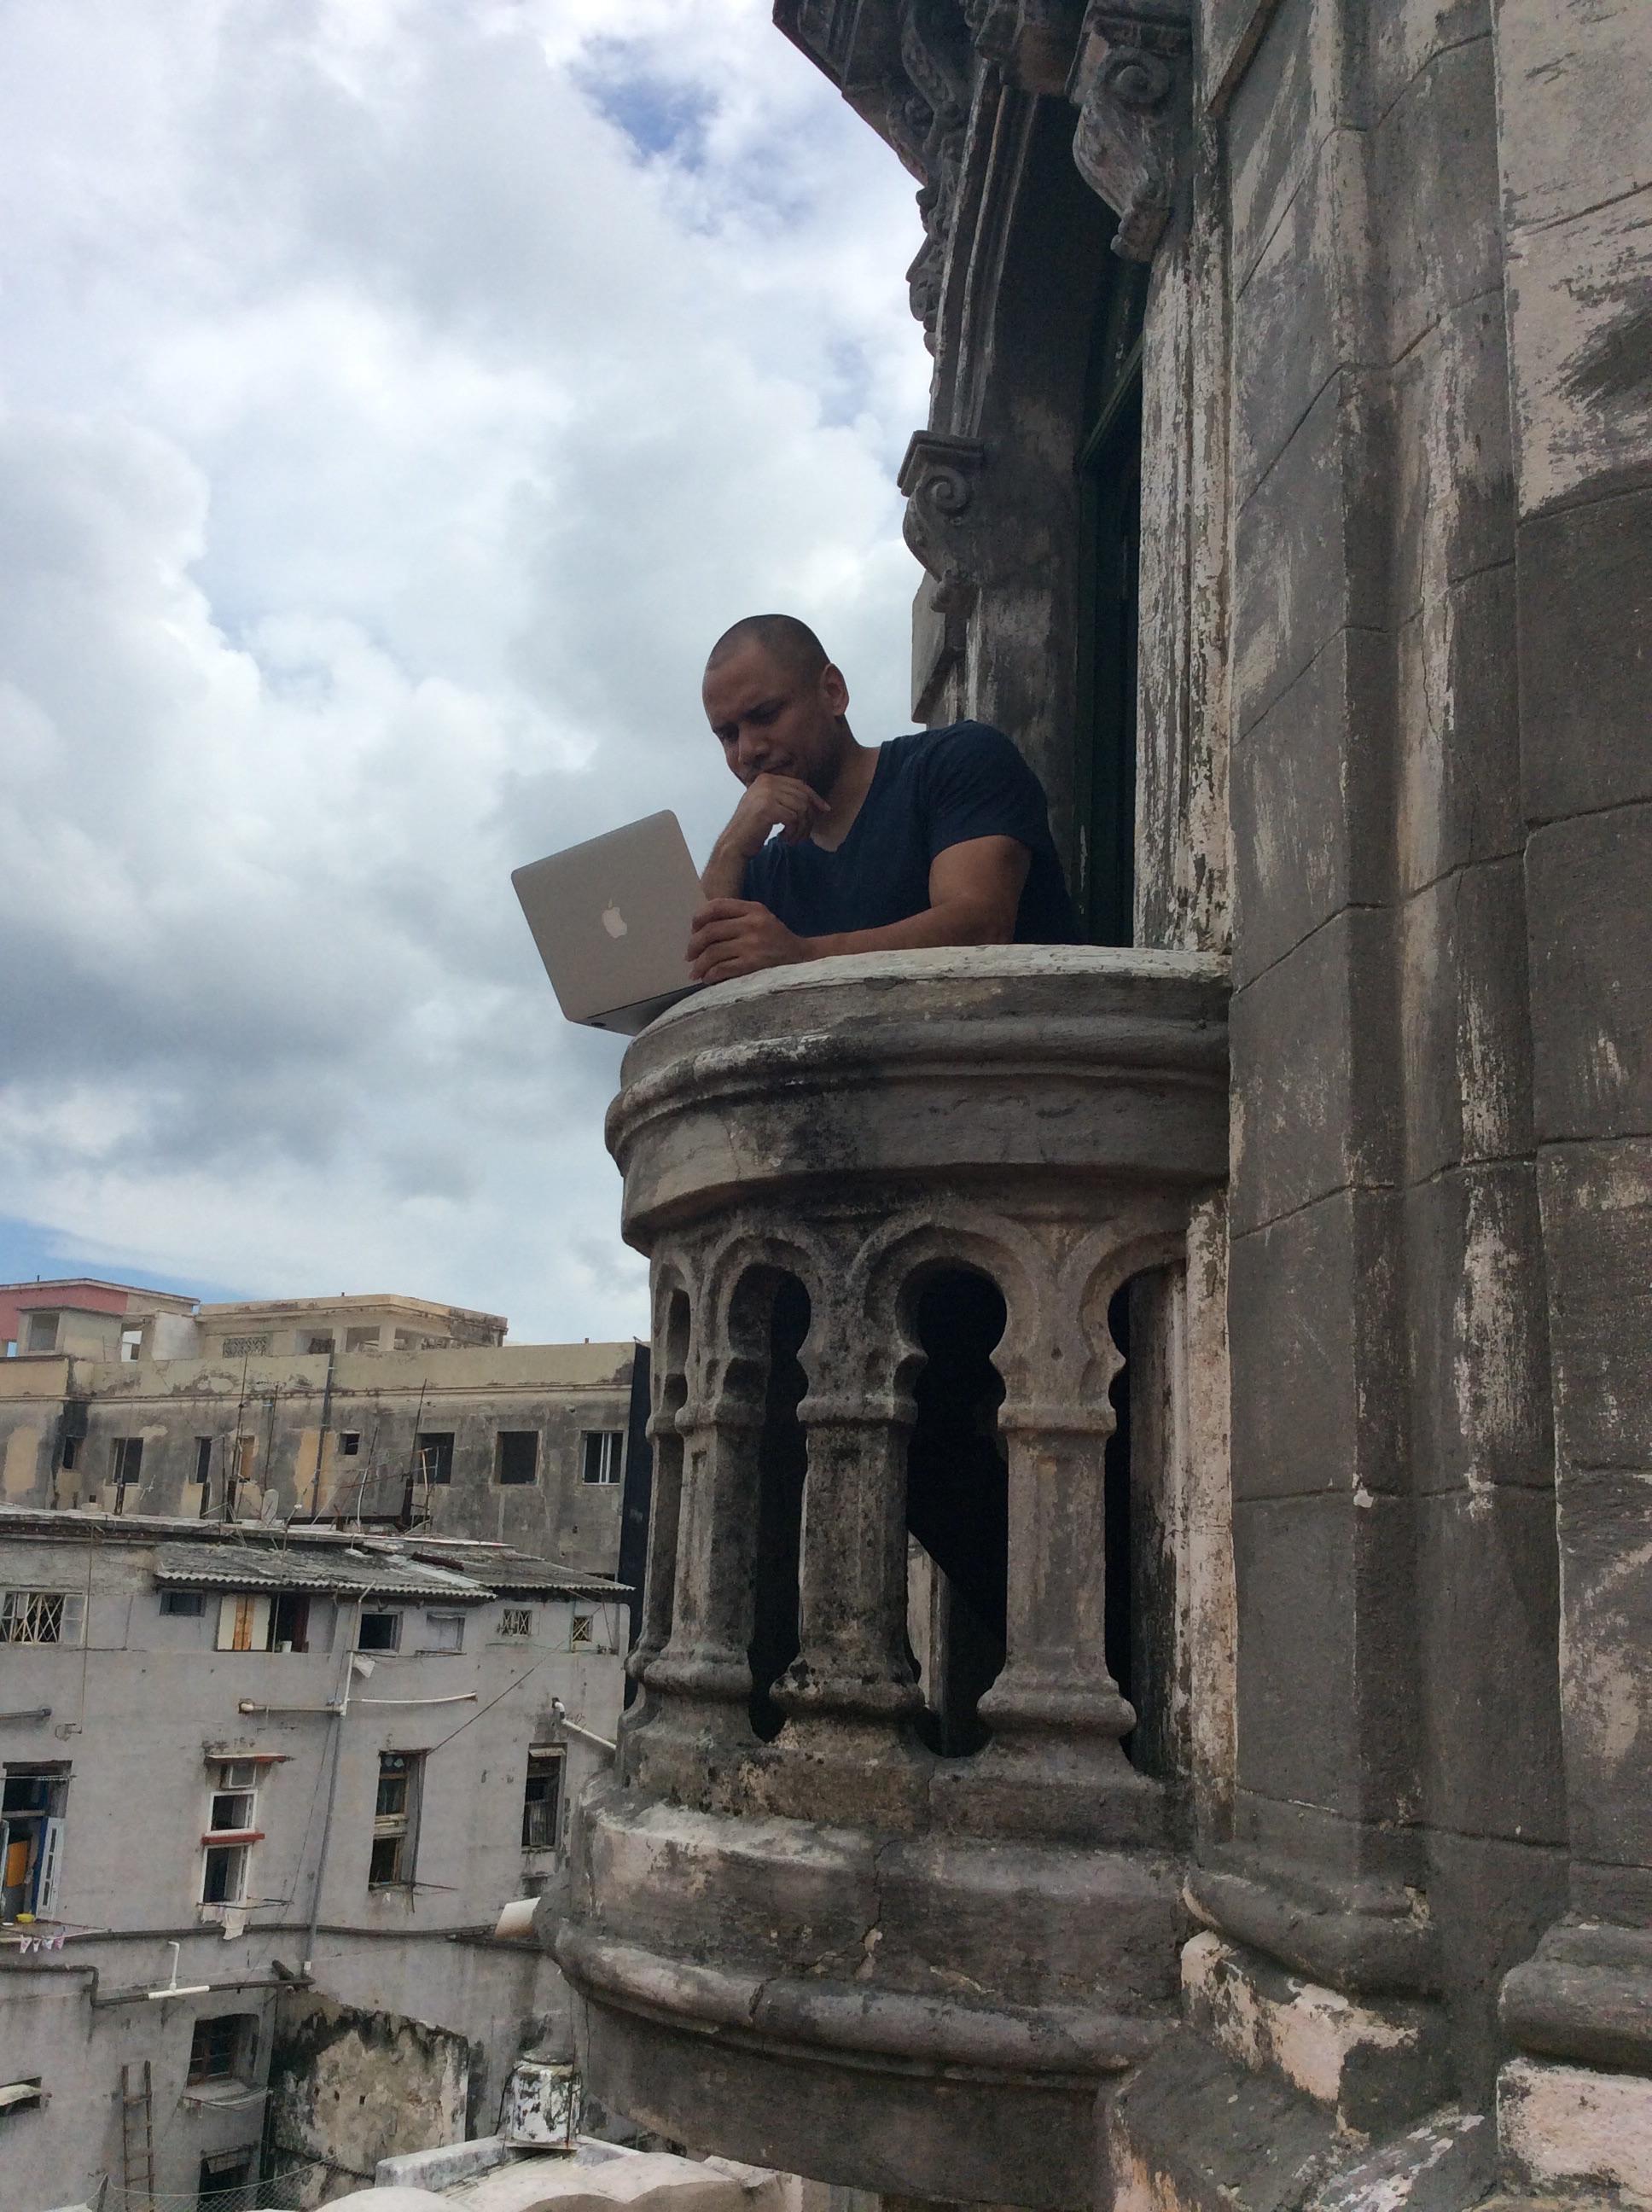 Havana, Cuba 2017